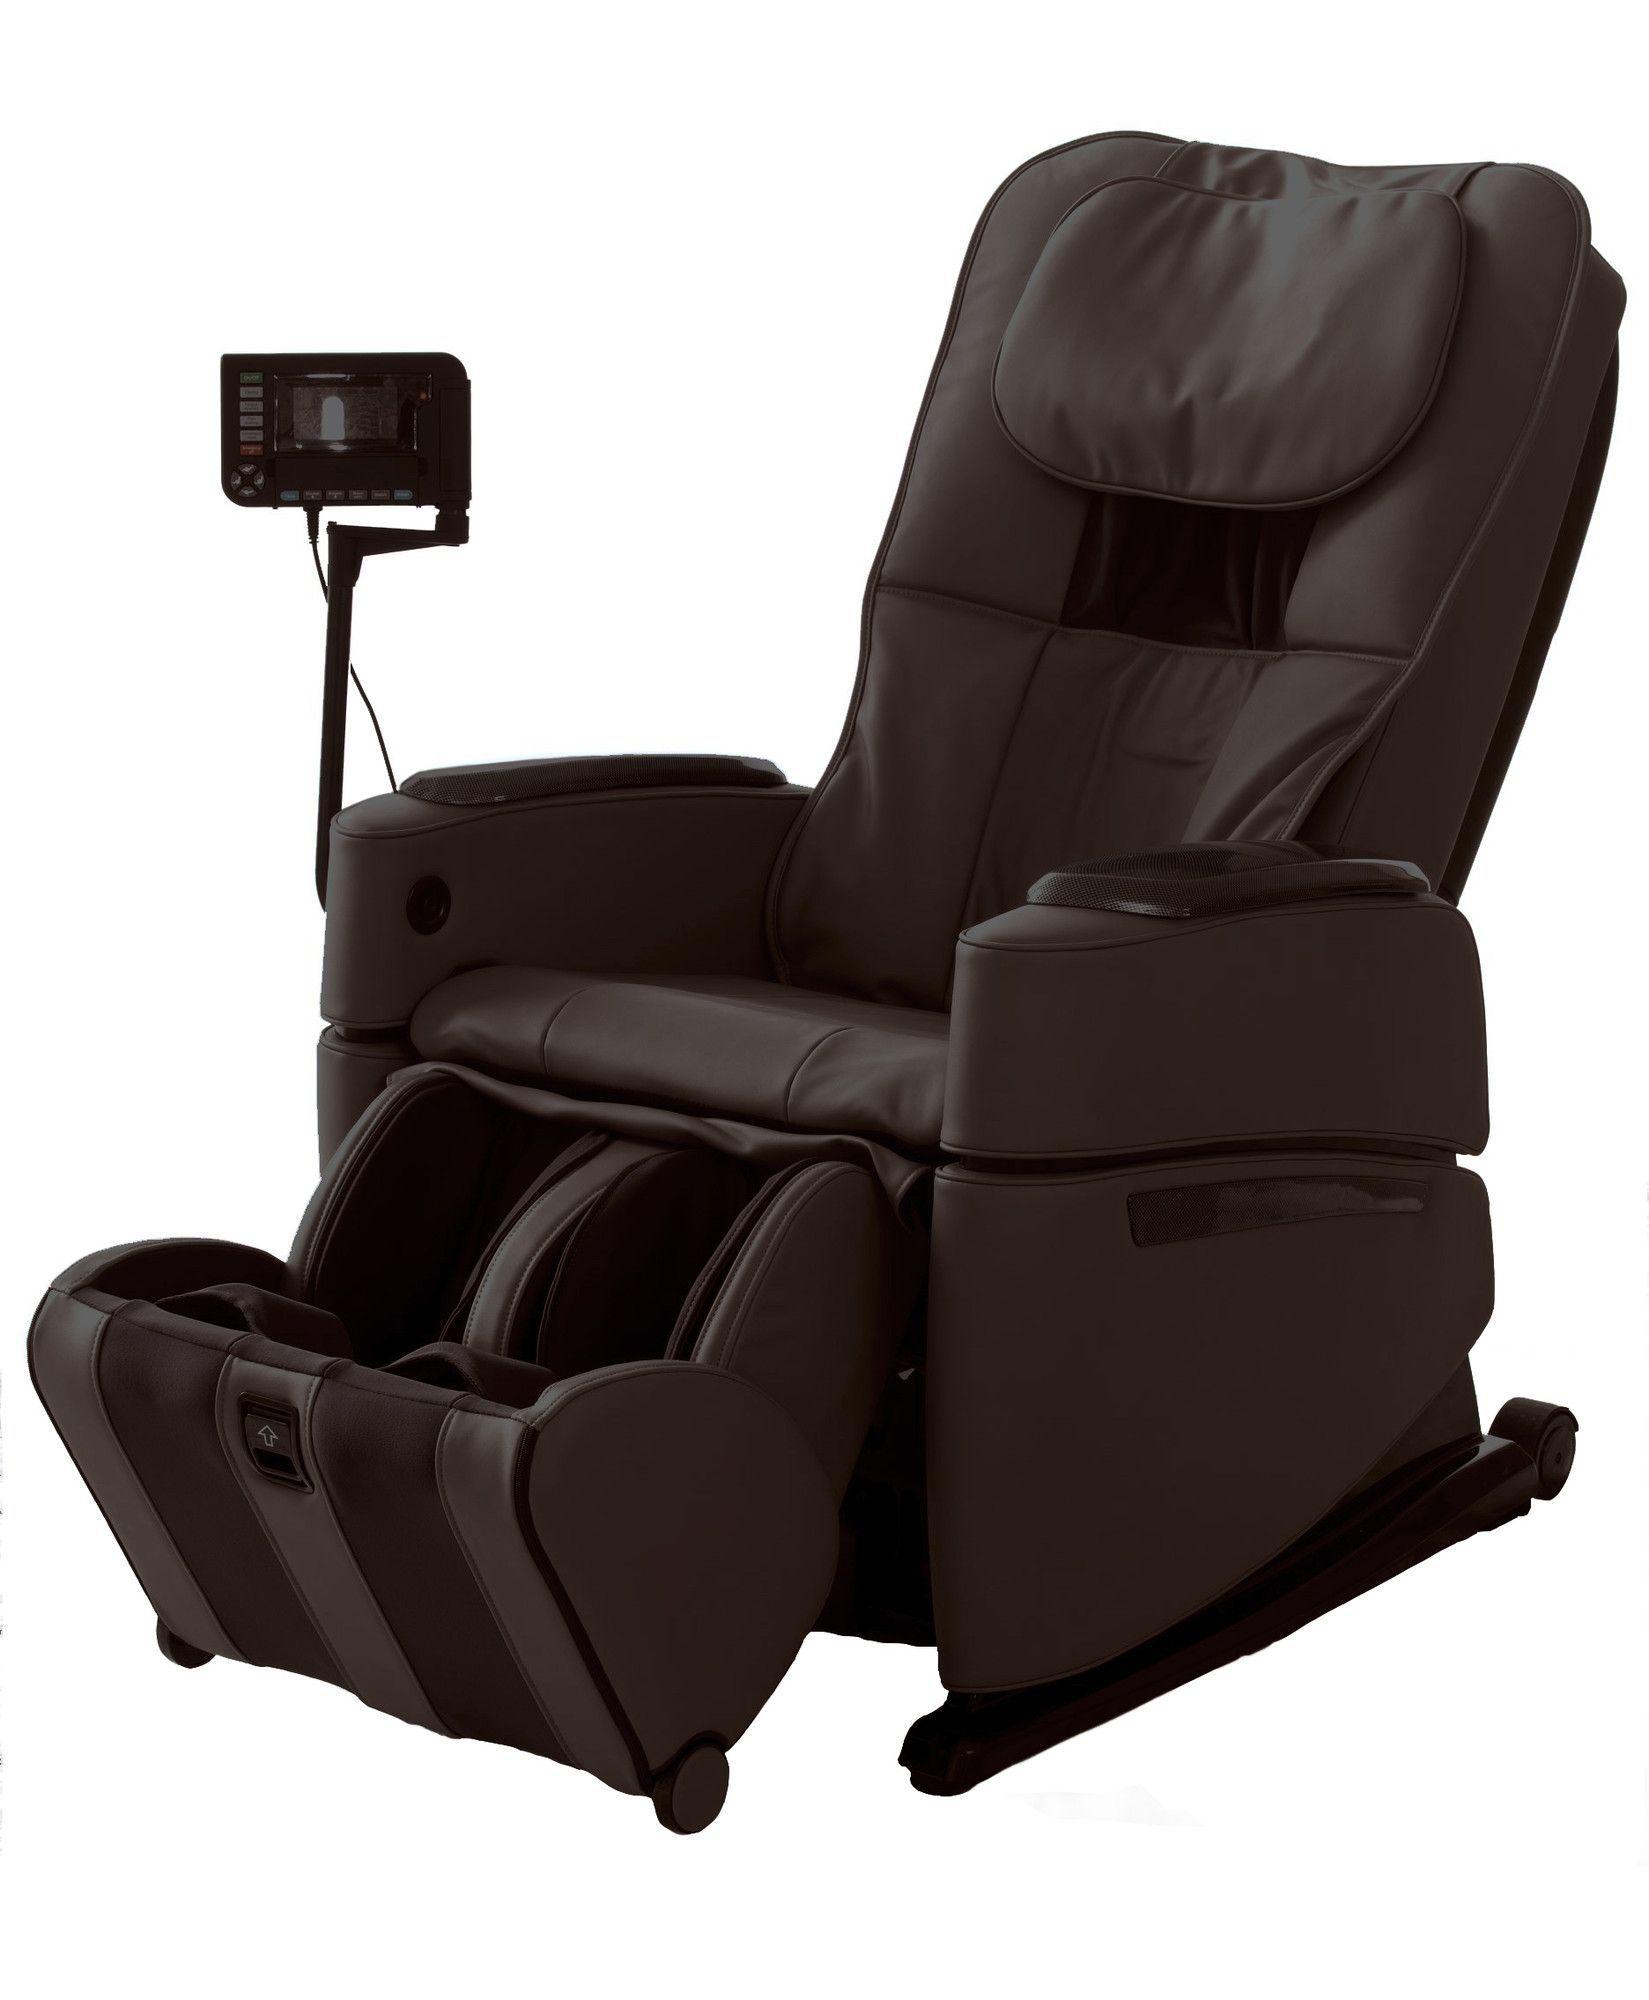 Os3d pro intelligent reclining adjustable width heated